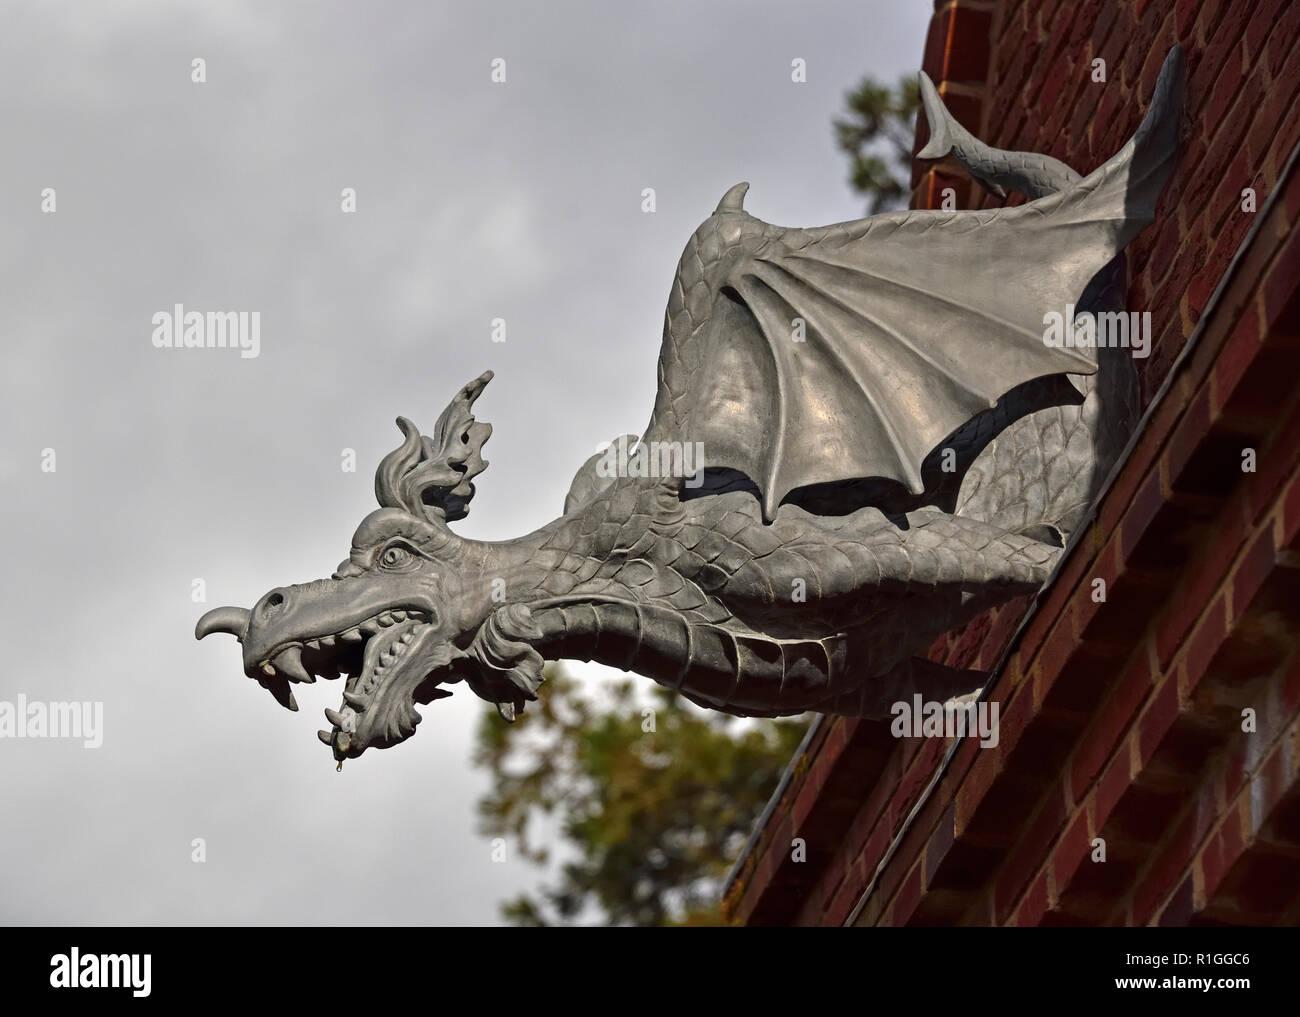 cast-lead-dragon-gargoyle-the-belvedere-queen-elizabeth-walled-garden-dumfries-house-cumnock-east-ayrshire-scotland-unired-kingdom-europe-R1GGC6.jpg